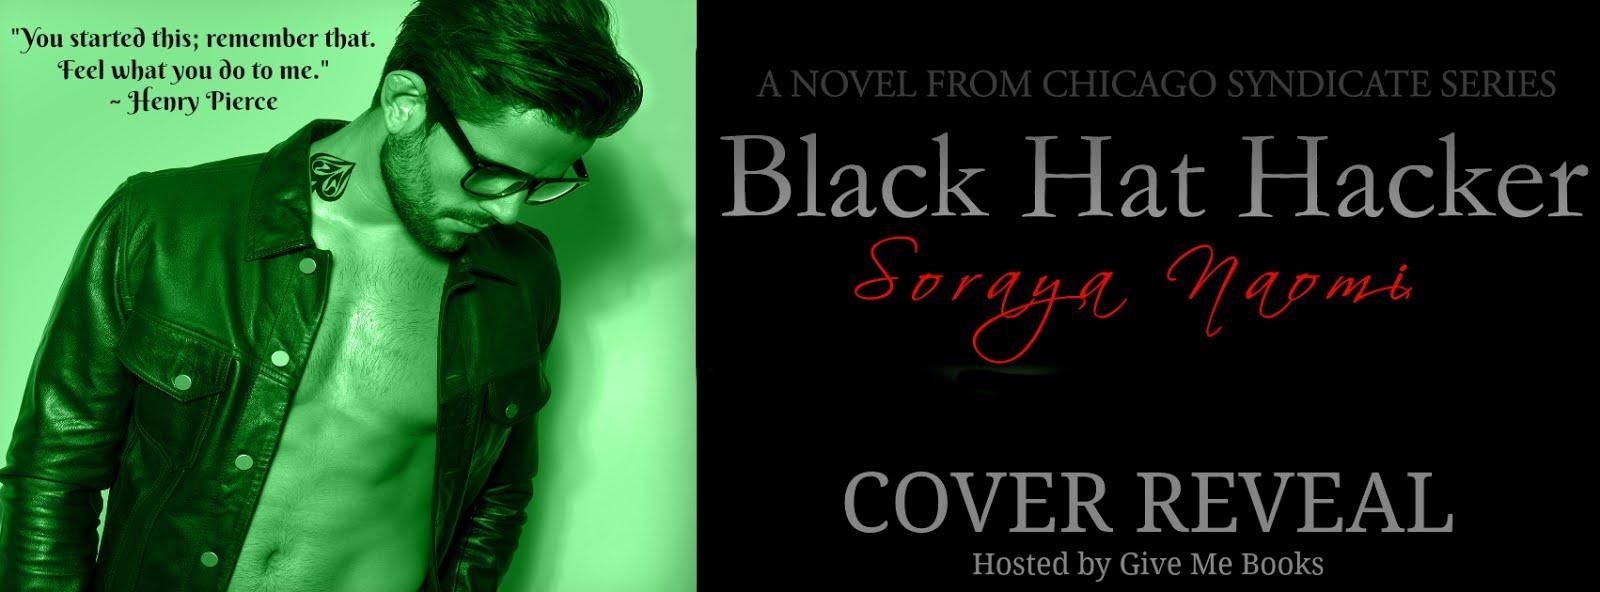 Black Hat Hacker Cover Reveal